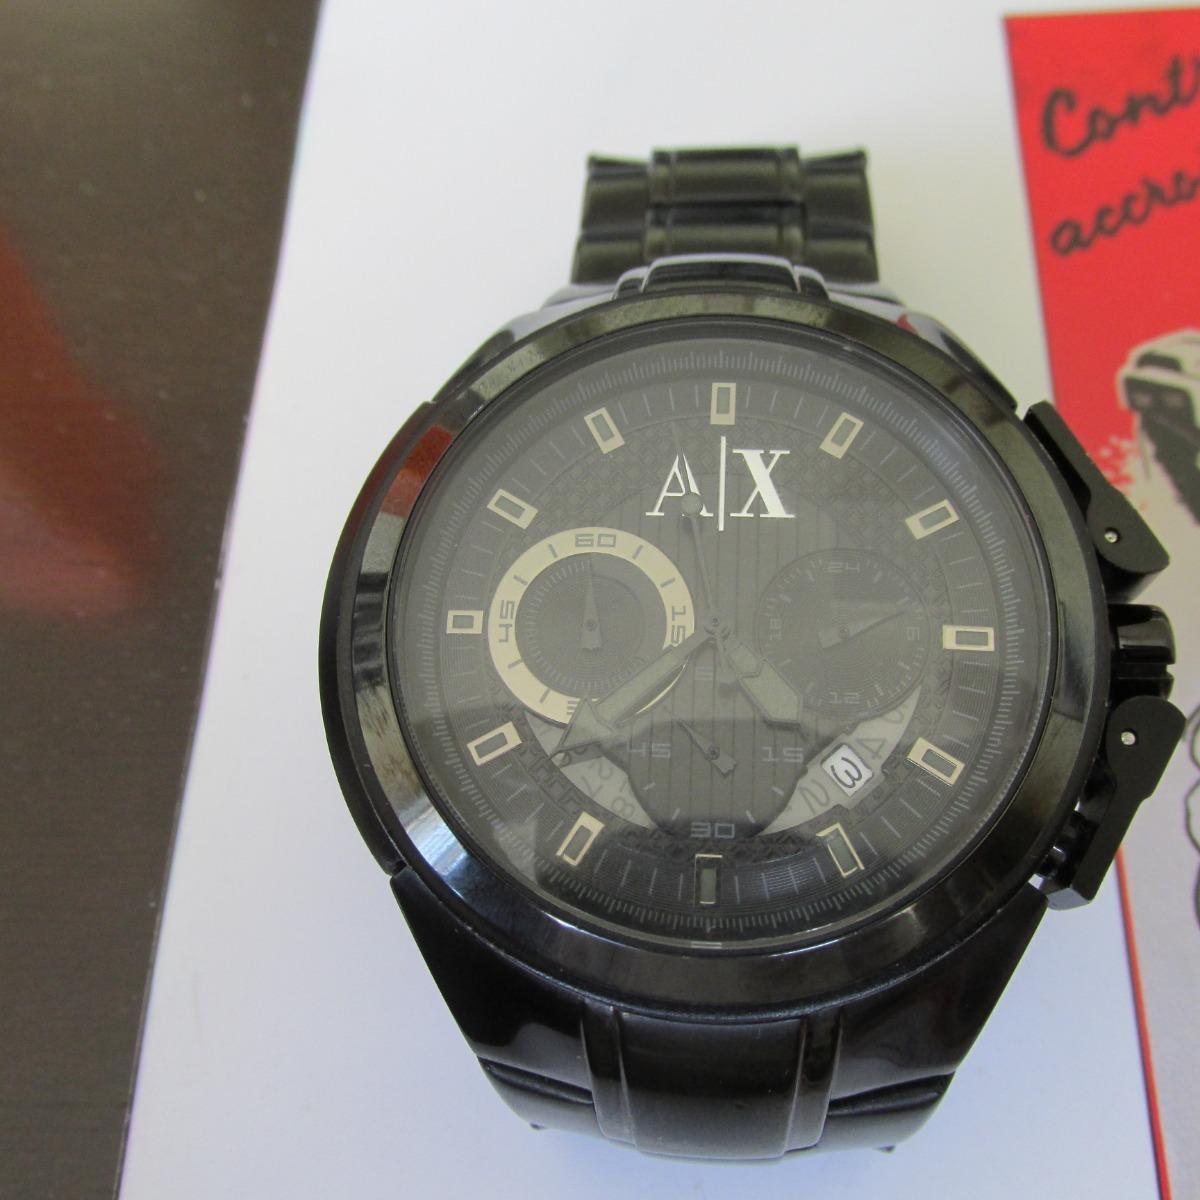 99208ce6640 Relógio Armani Exchange Quartz Vidro Cristal Mineral - R  500